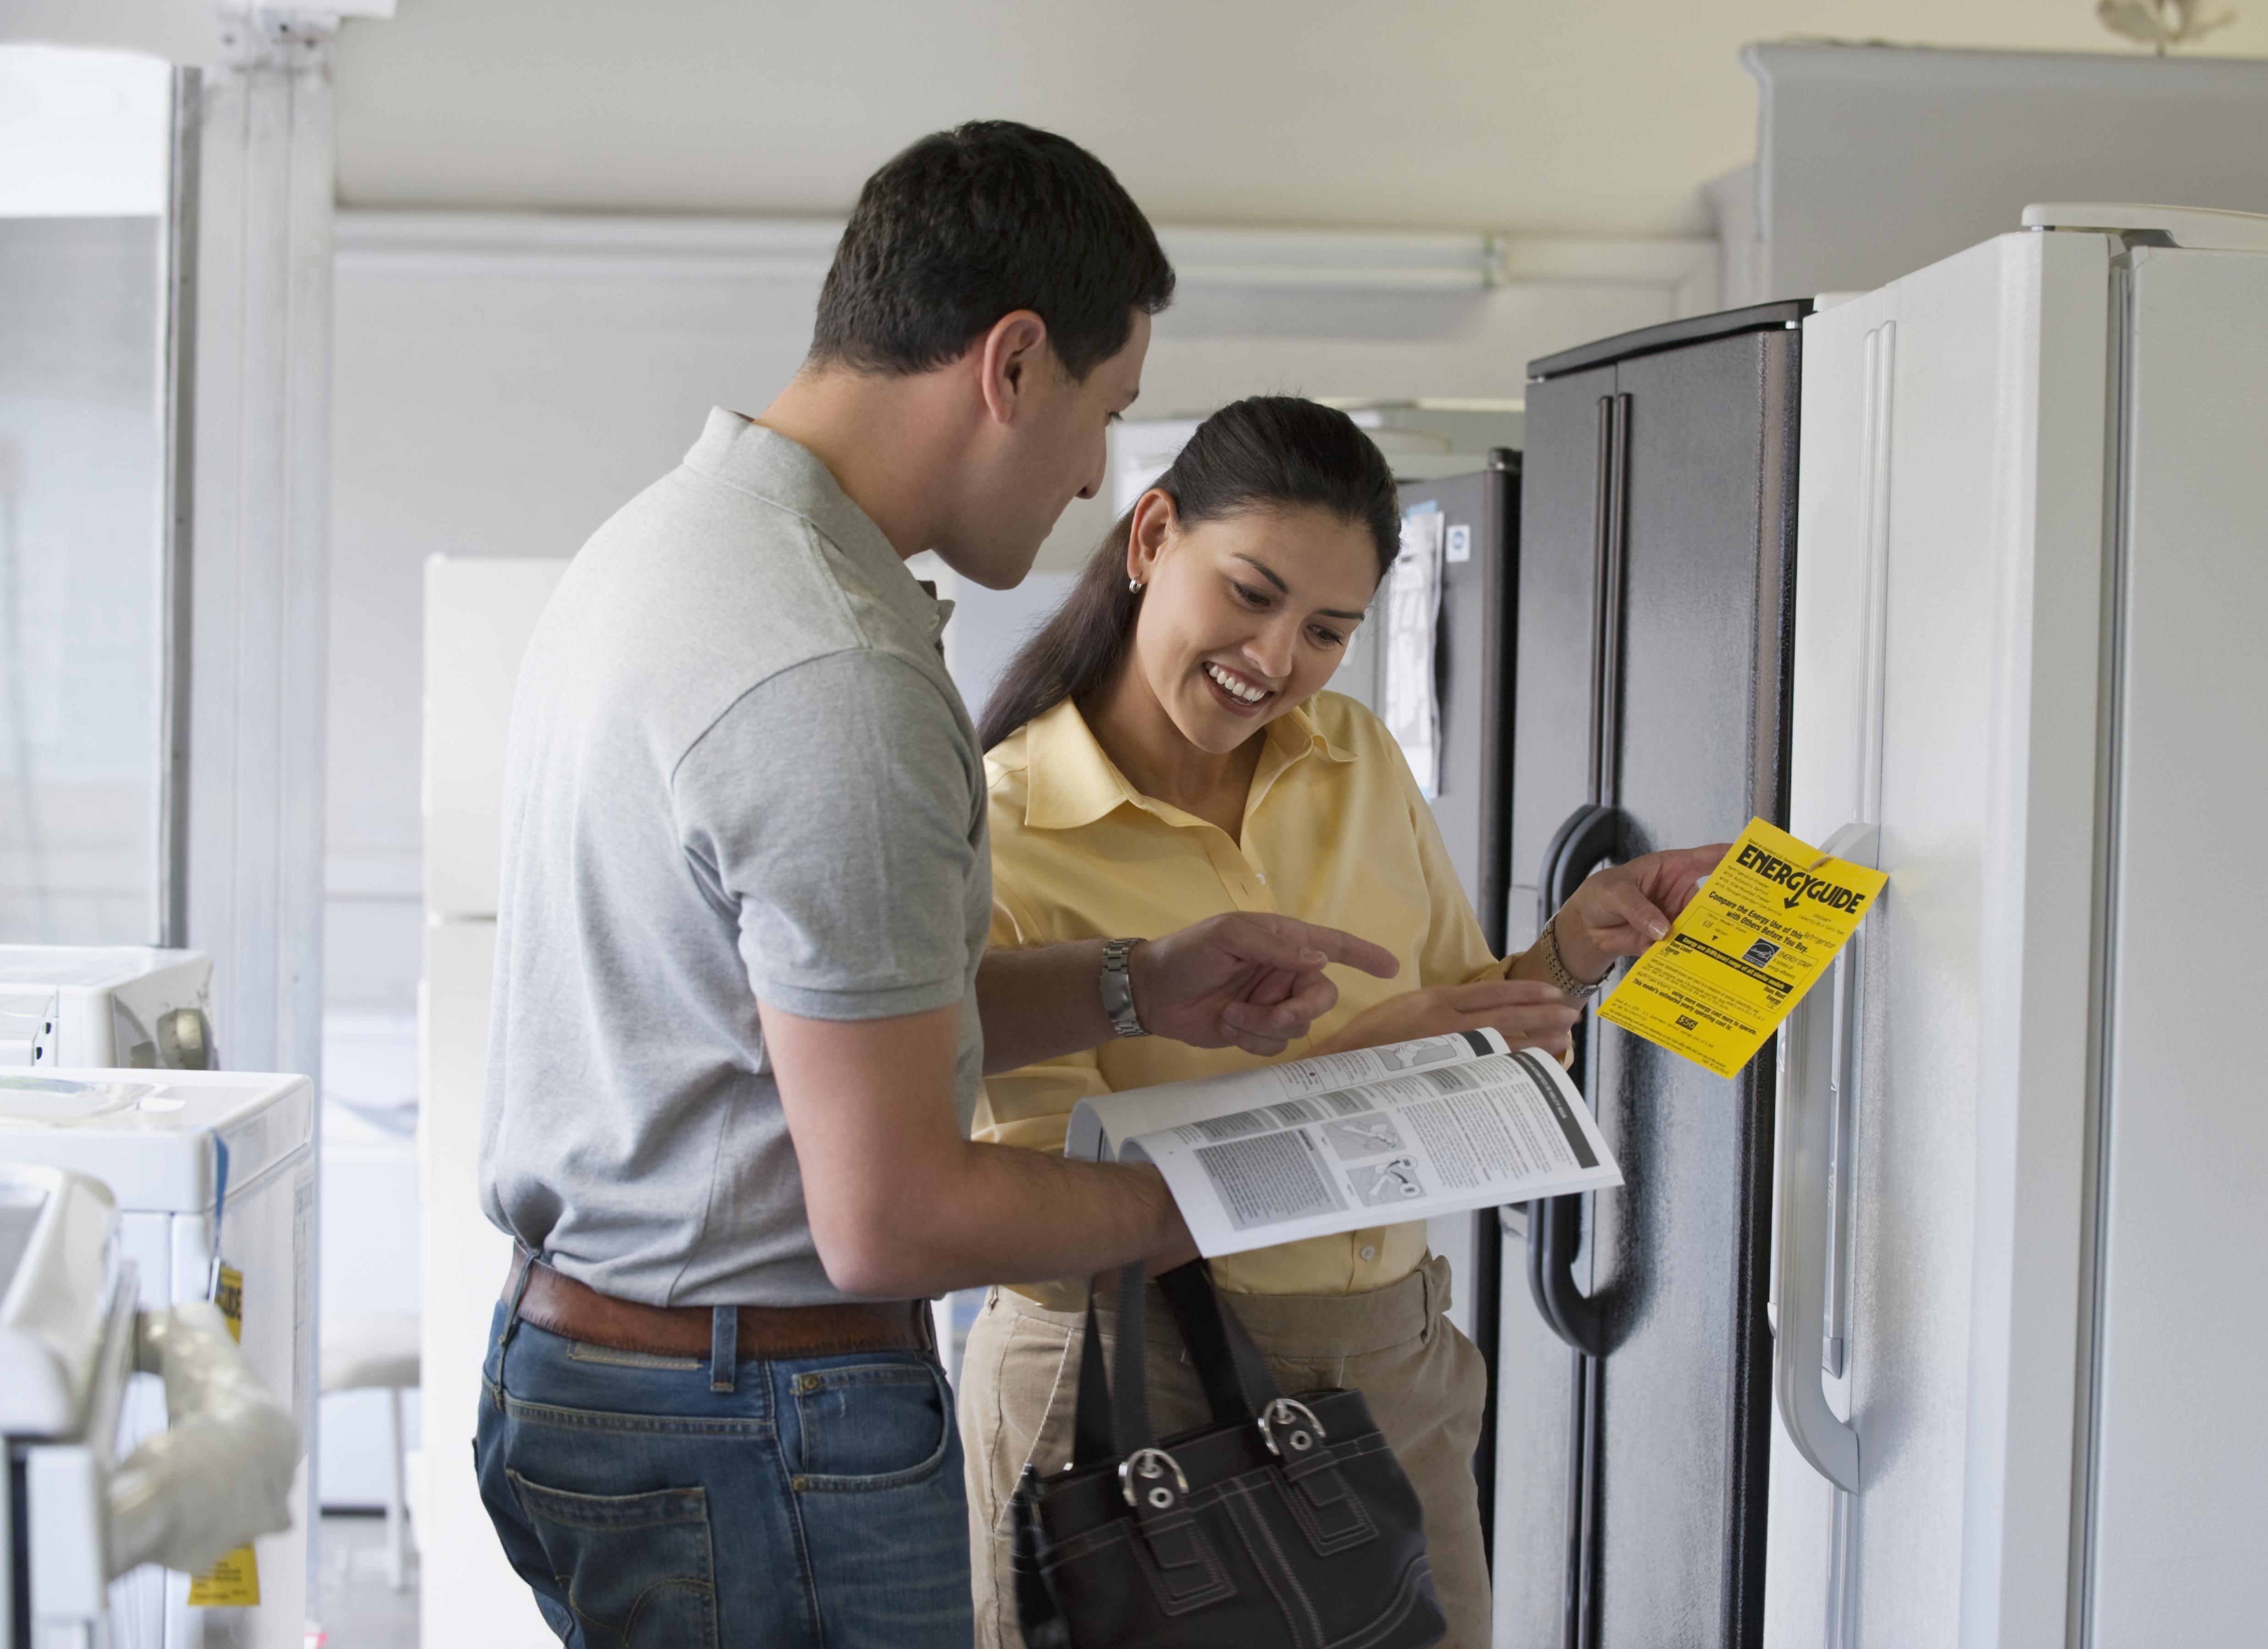 Hispanic couple shopping for refrigerator